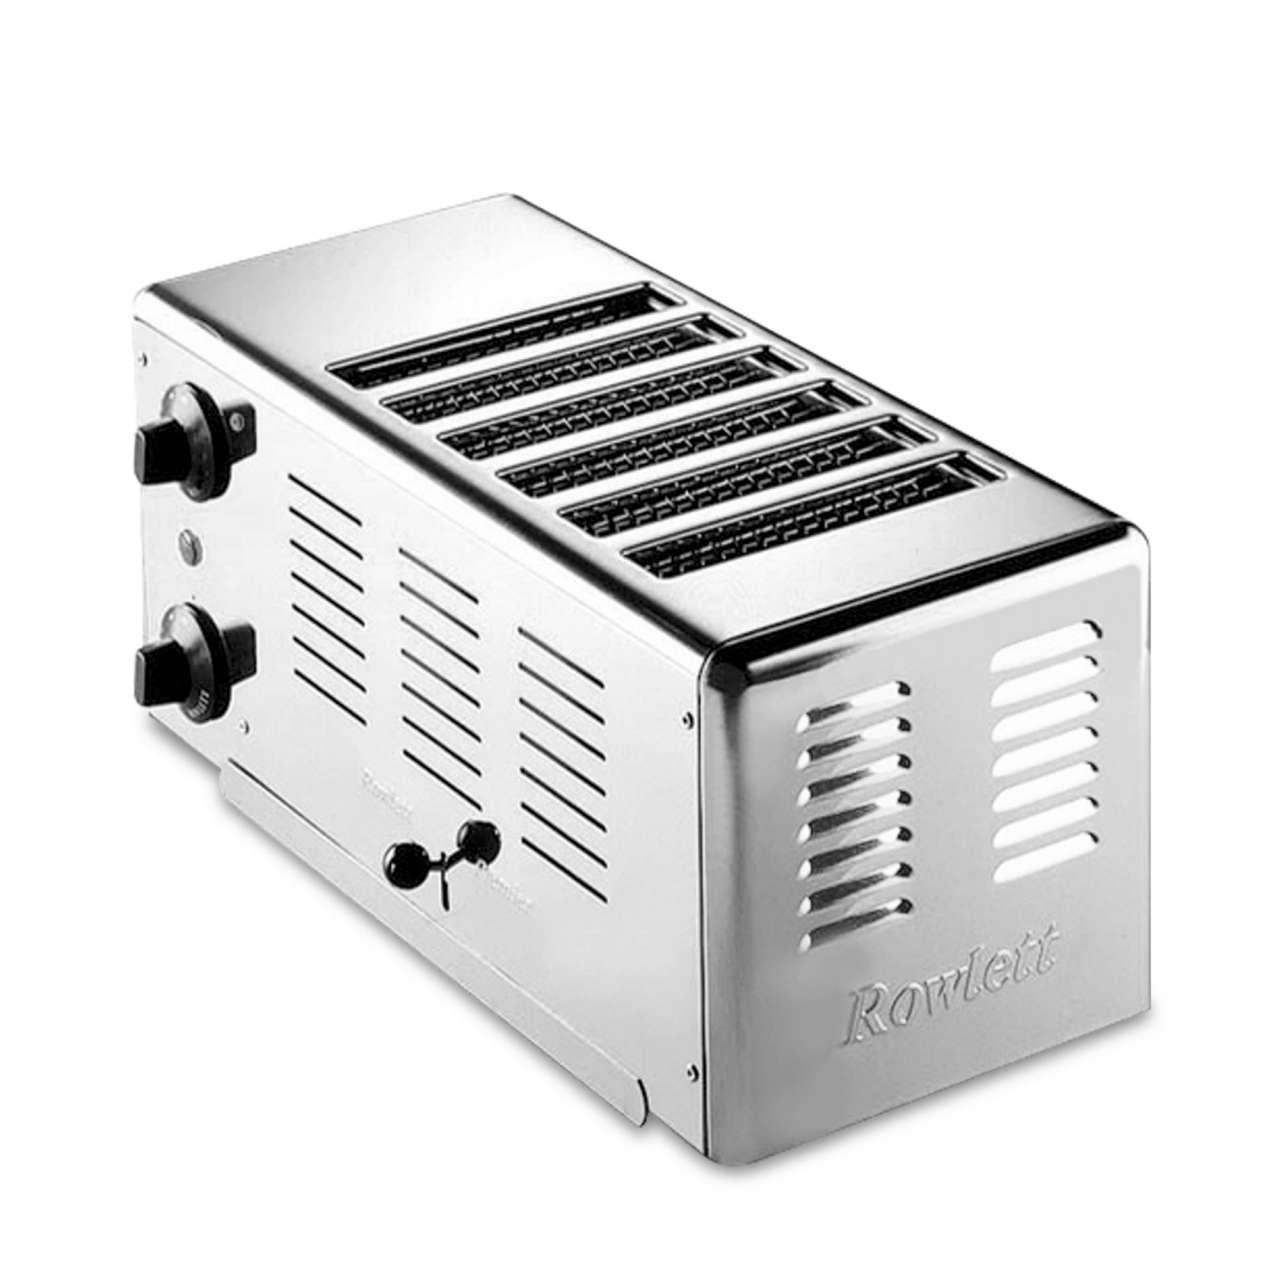 Gastroback Rowlett Edelstahl-Toaster (6 Toast)